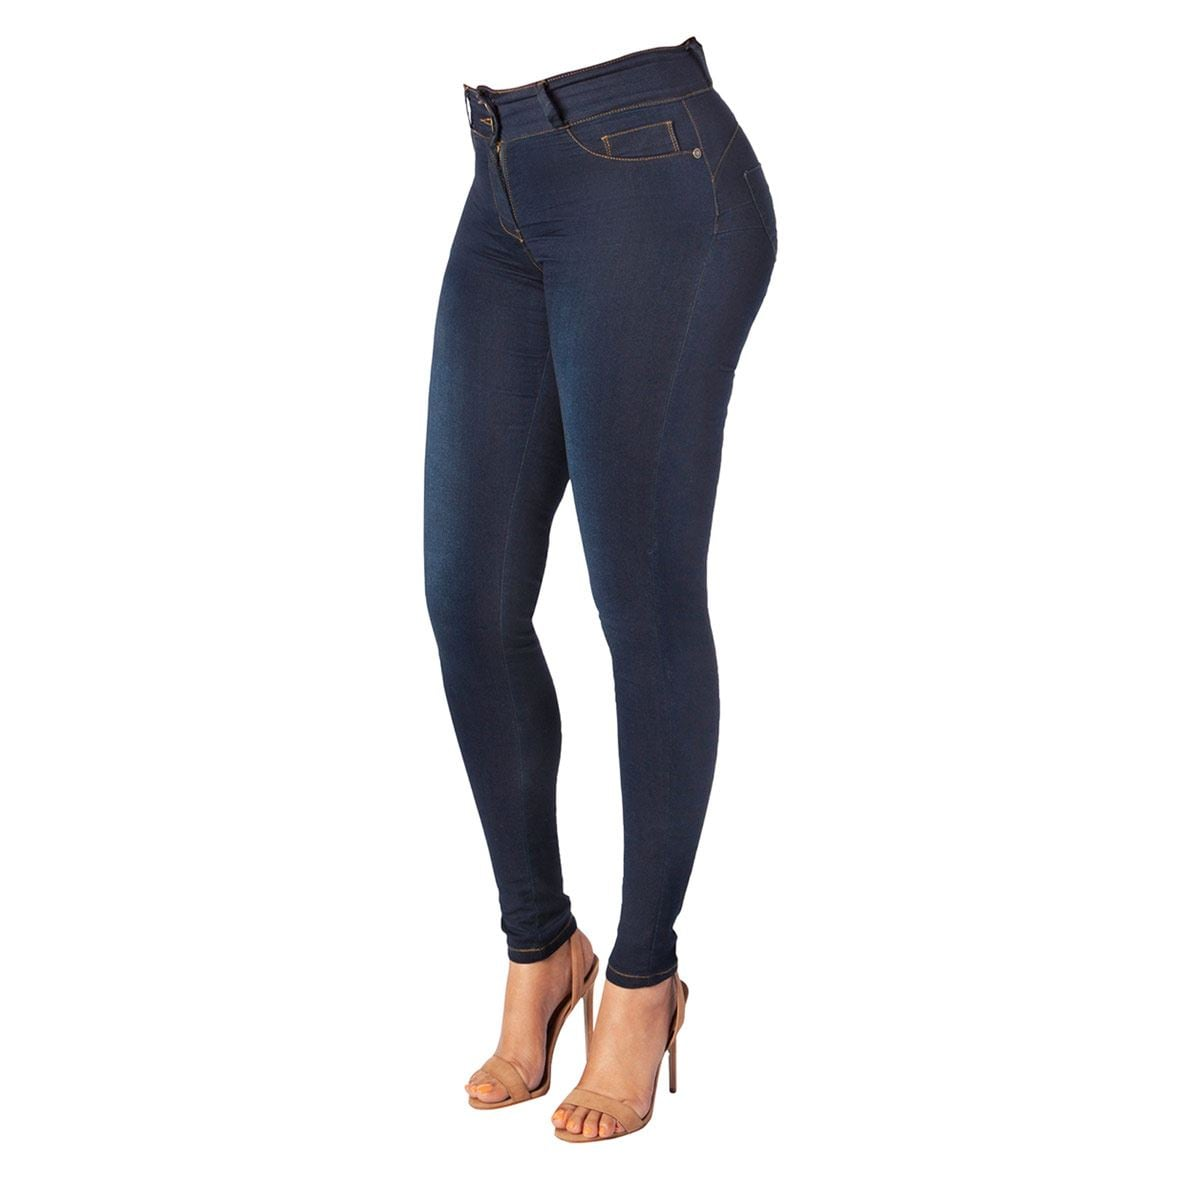 Jeans Ajustables Myfit Inova